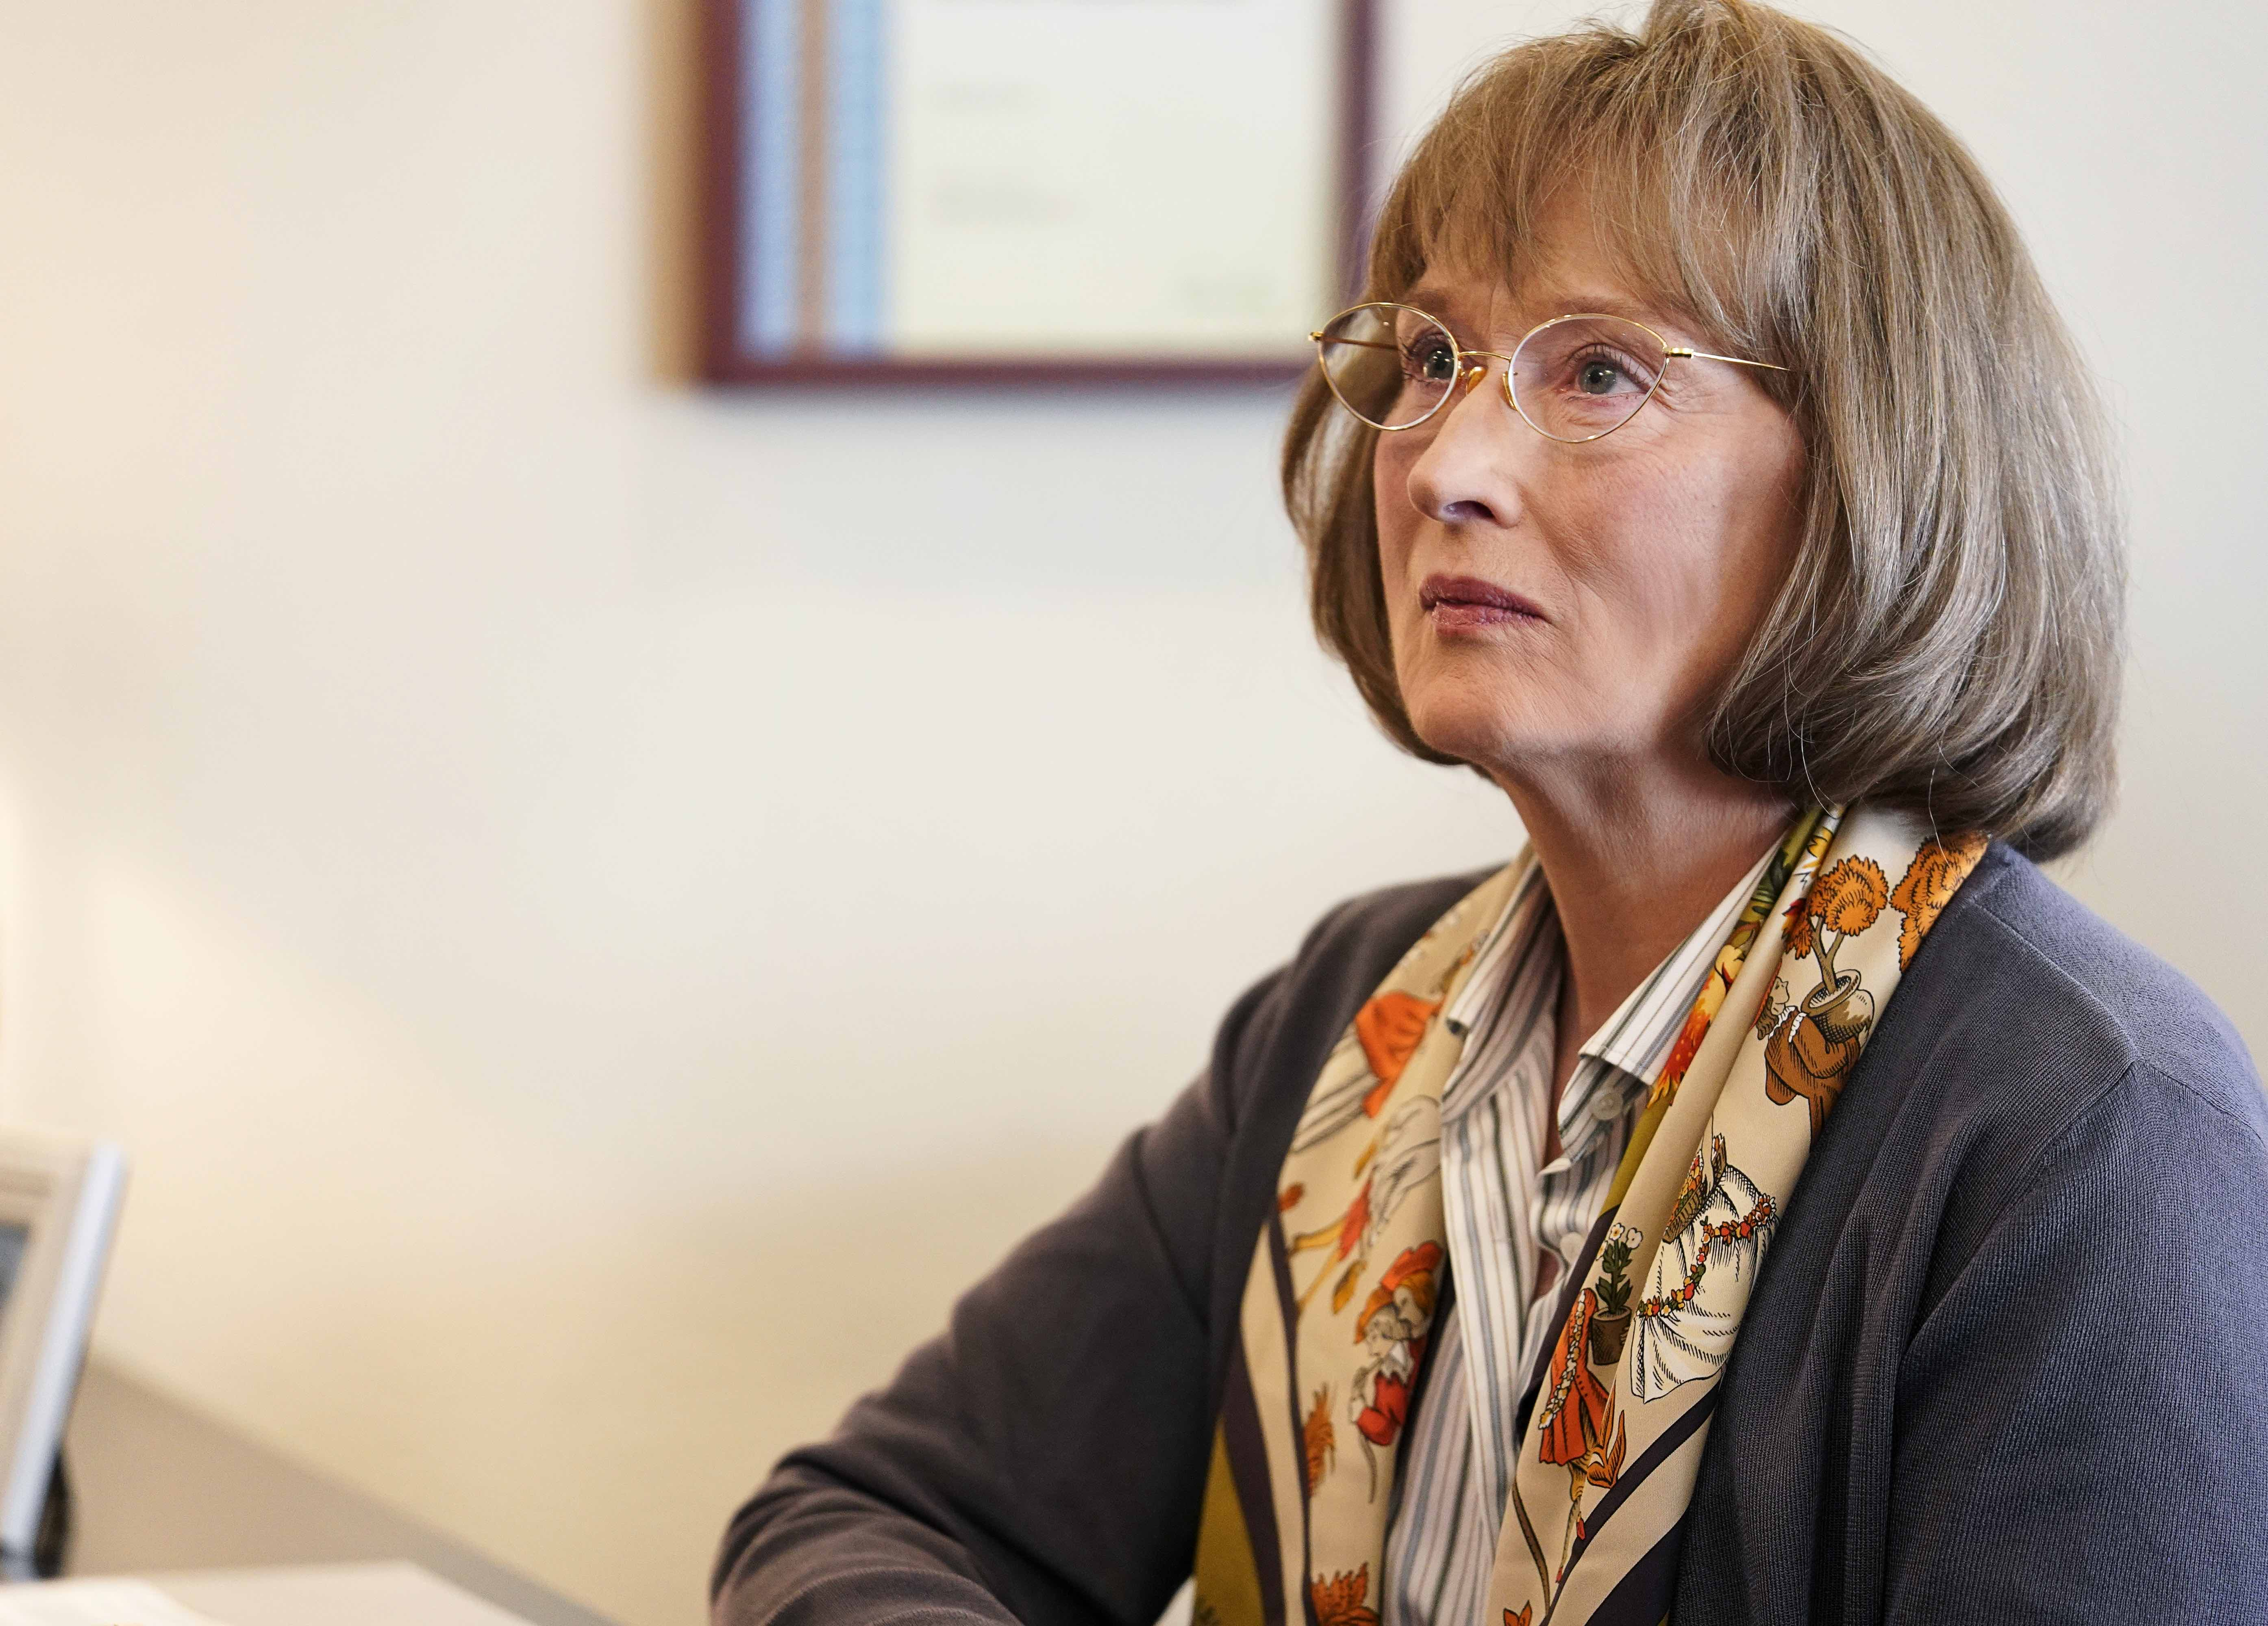 Meryl Streep, Big Little Lies, skuespiller, skuespillerinde, oscarvinder